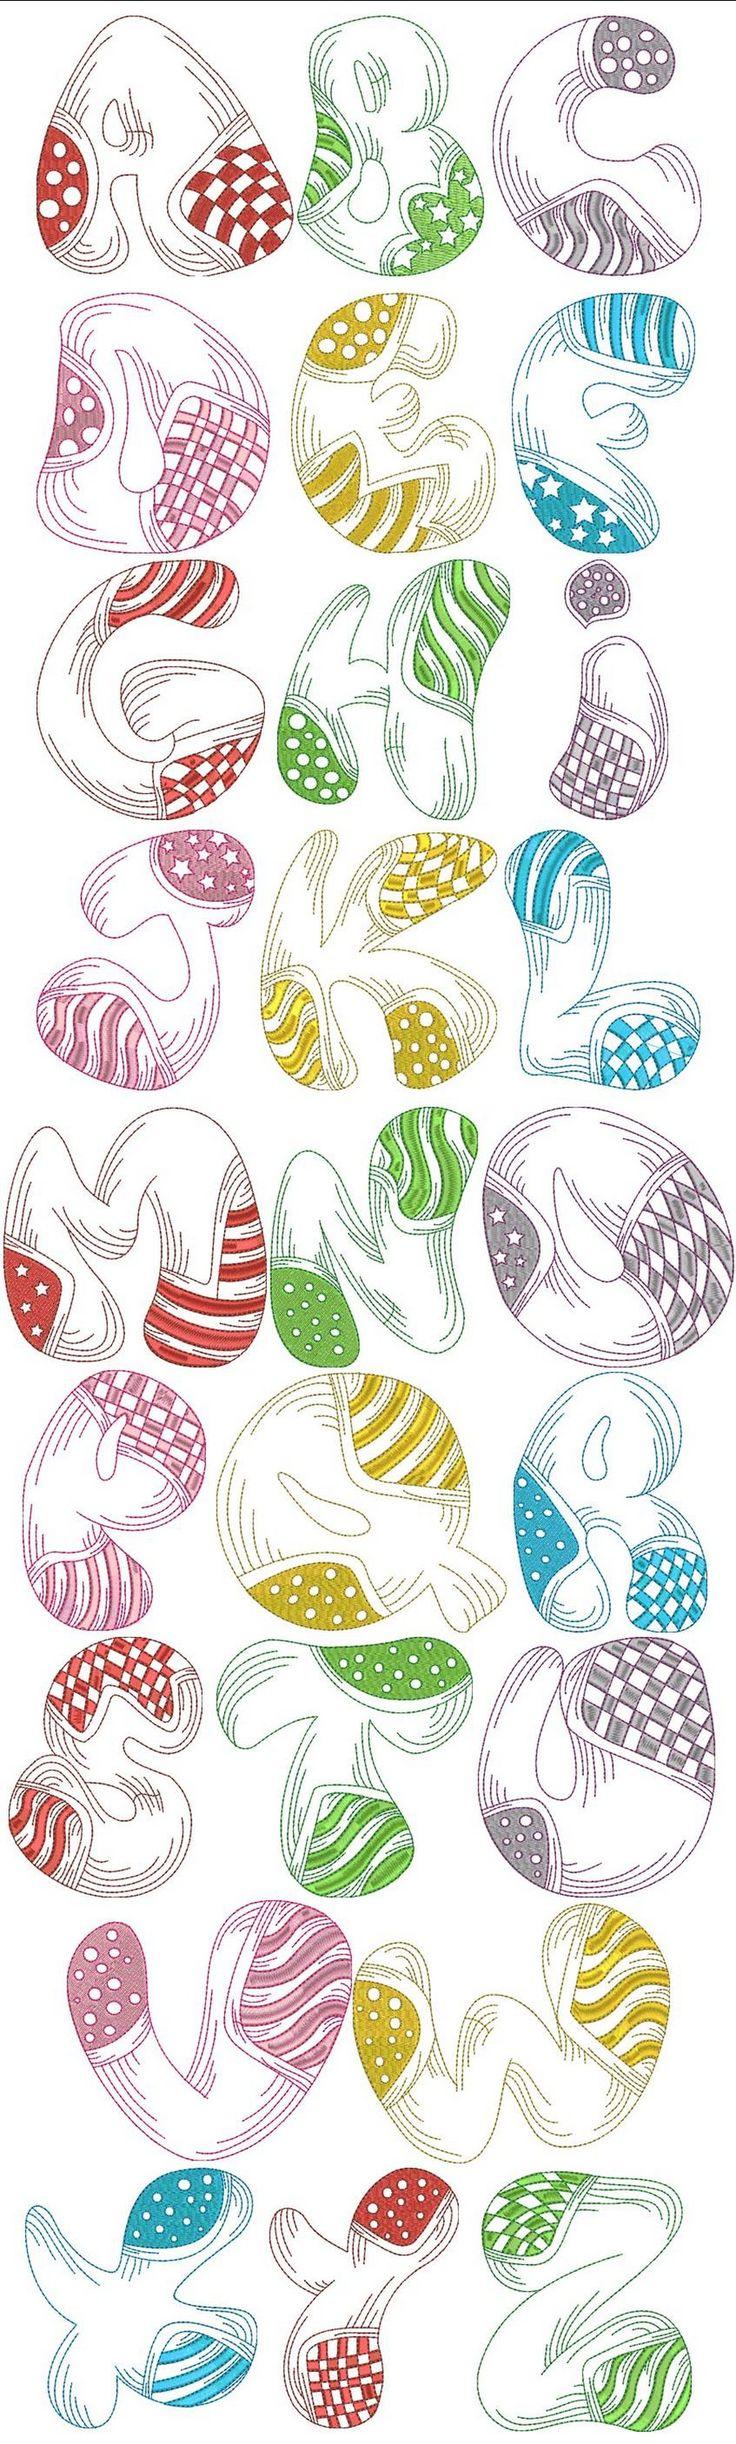 Alphabet letters numbers 2 pinterest bilder for Embroidery office design version 7 5